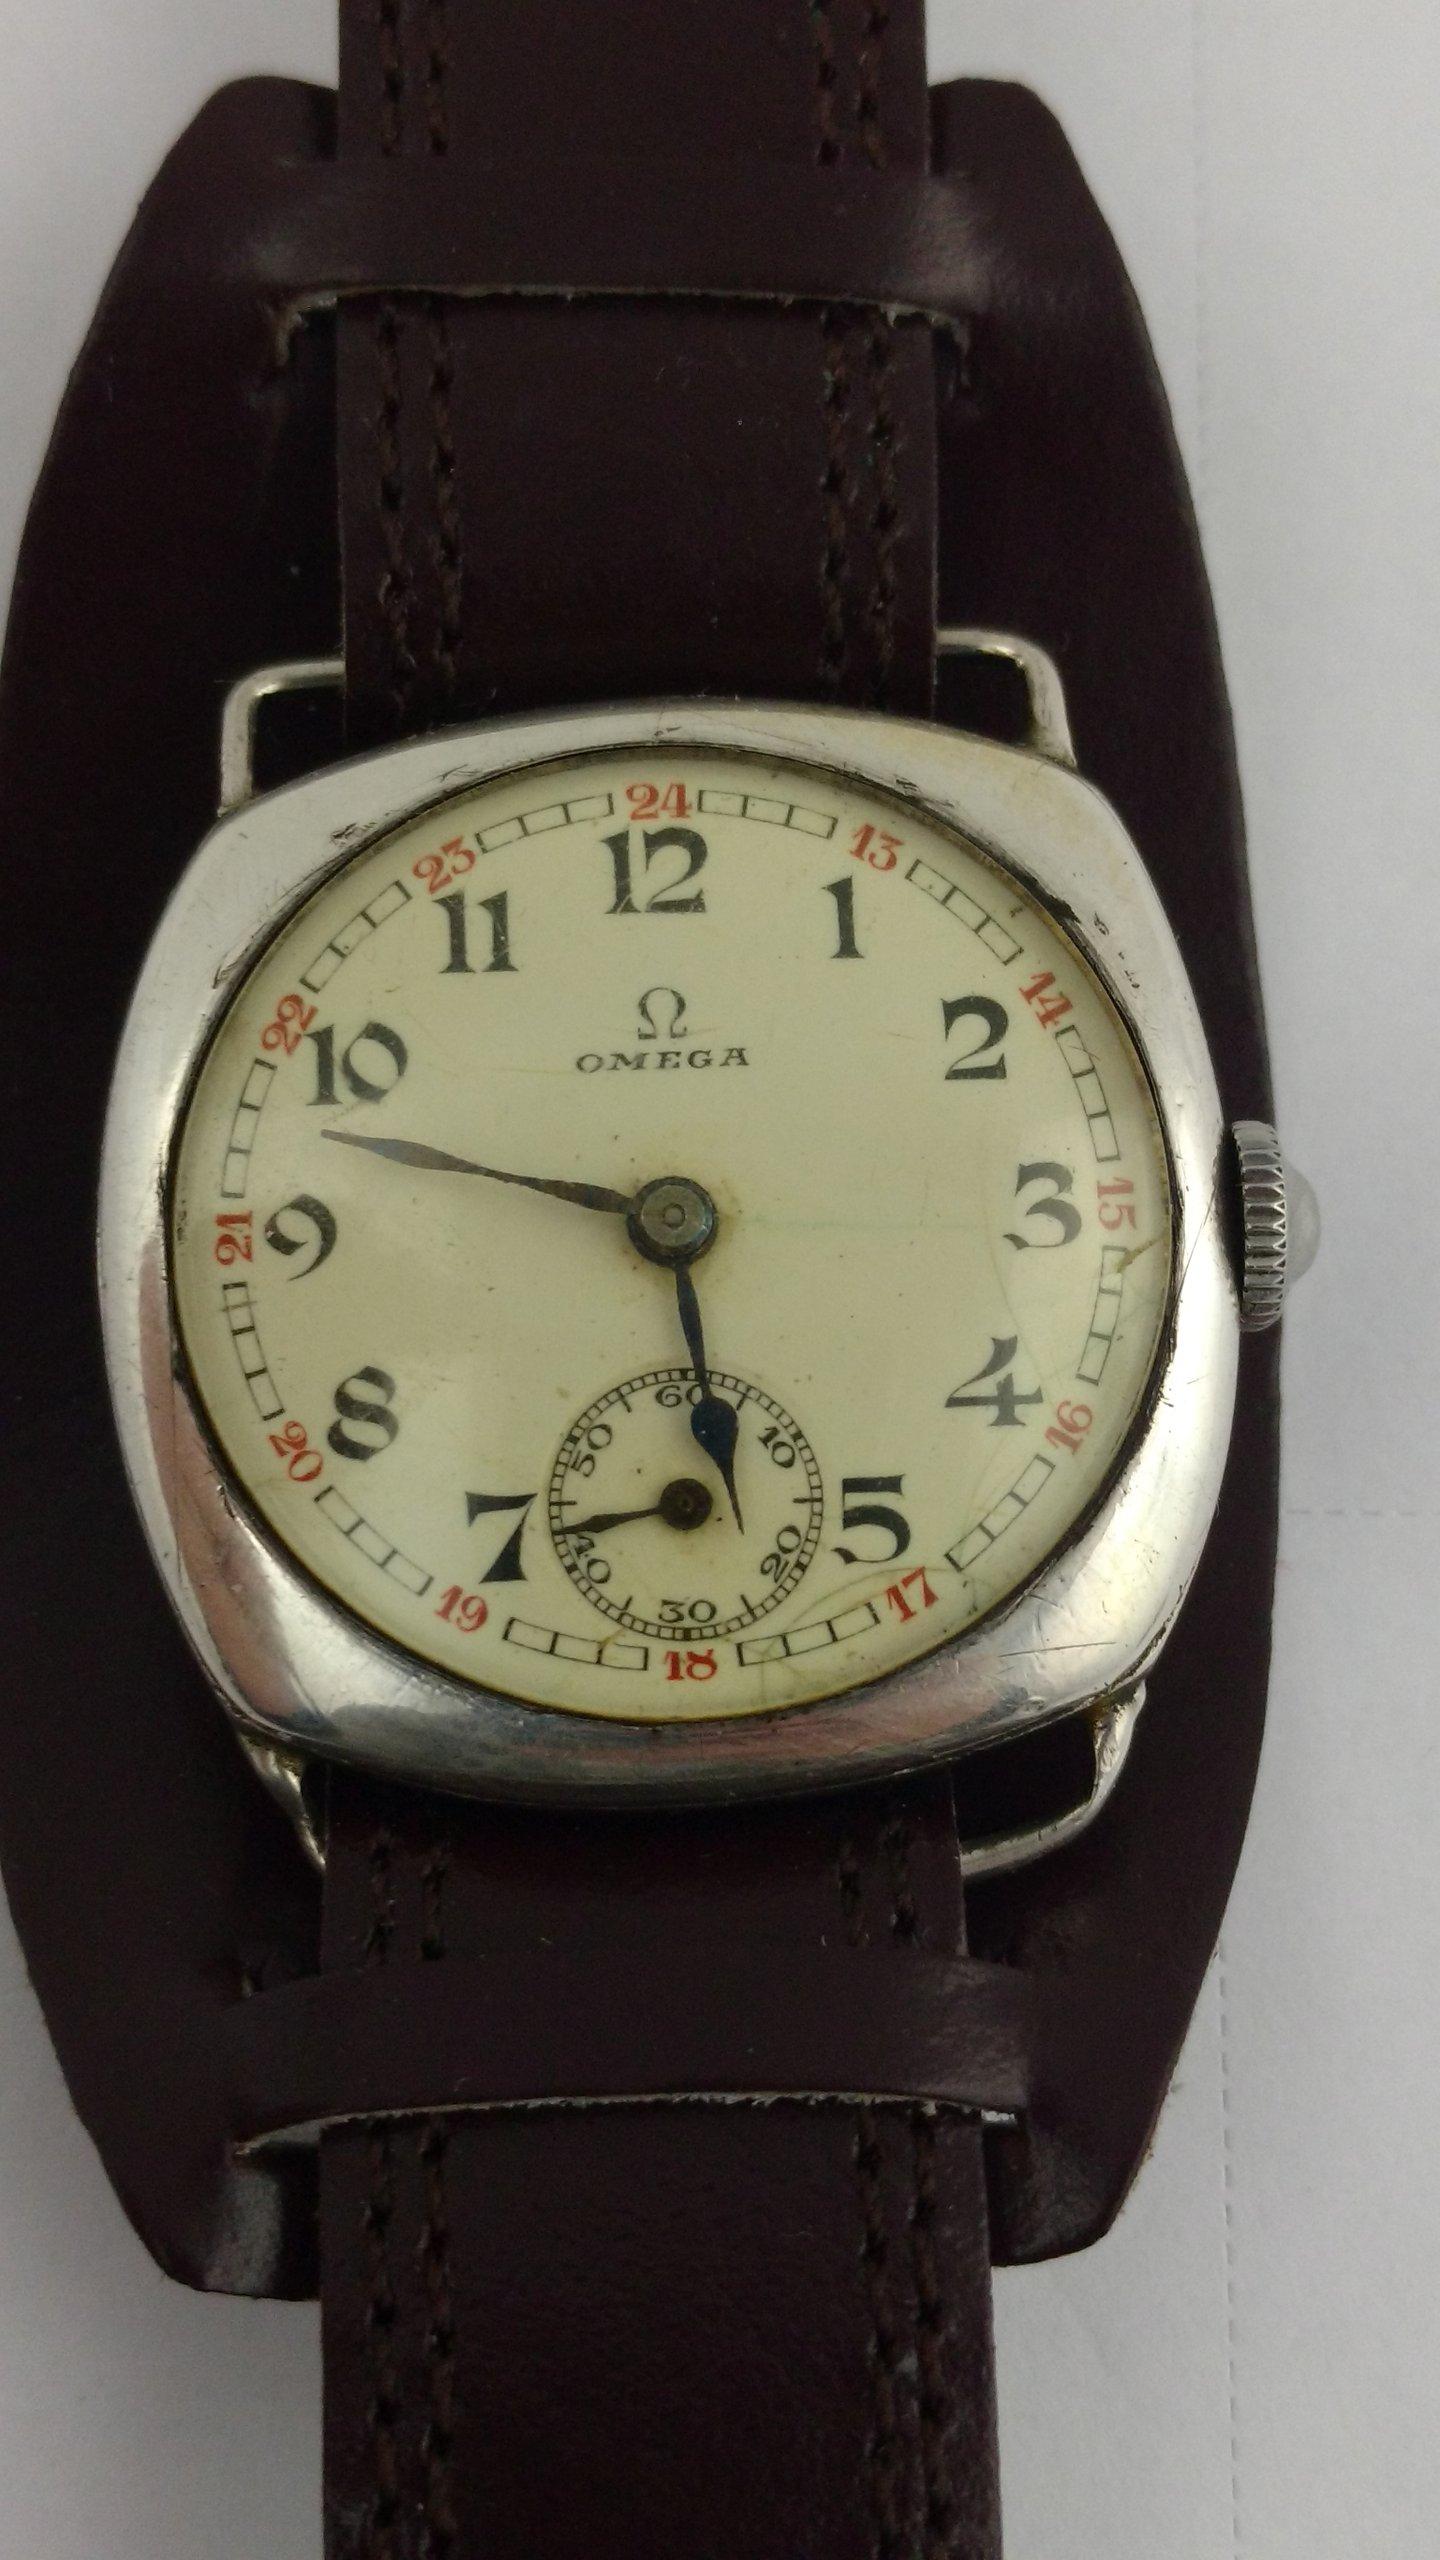 SREBRNA OMEGA zegarek Vintage UNIKAT